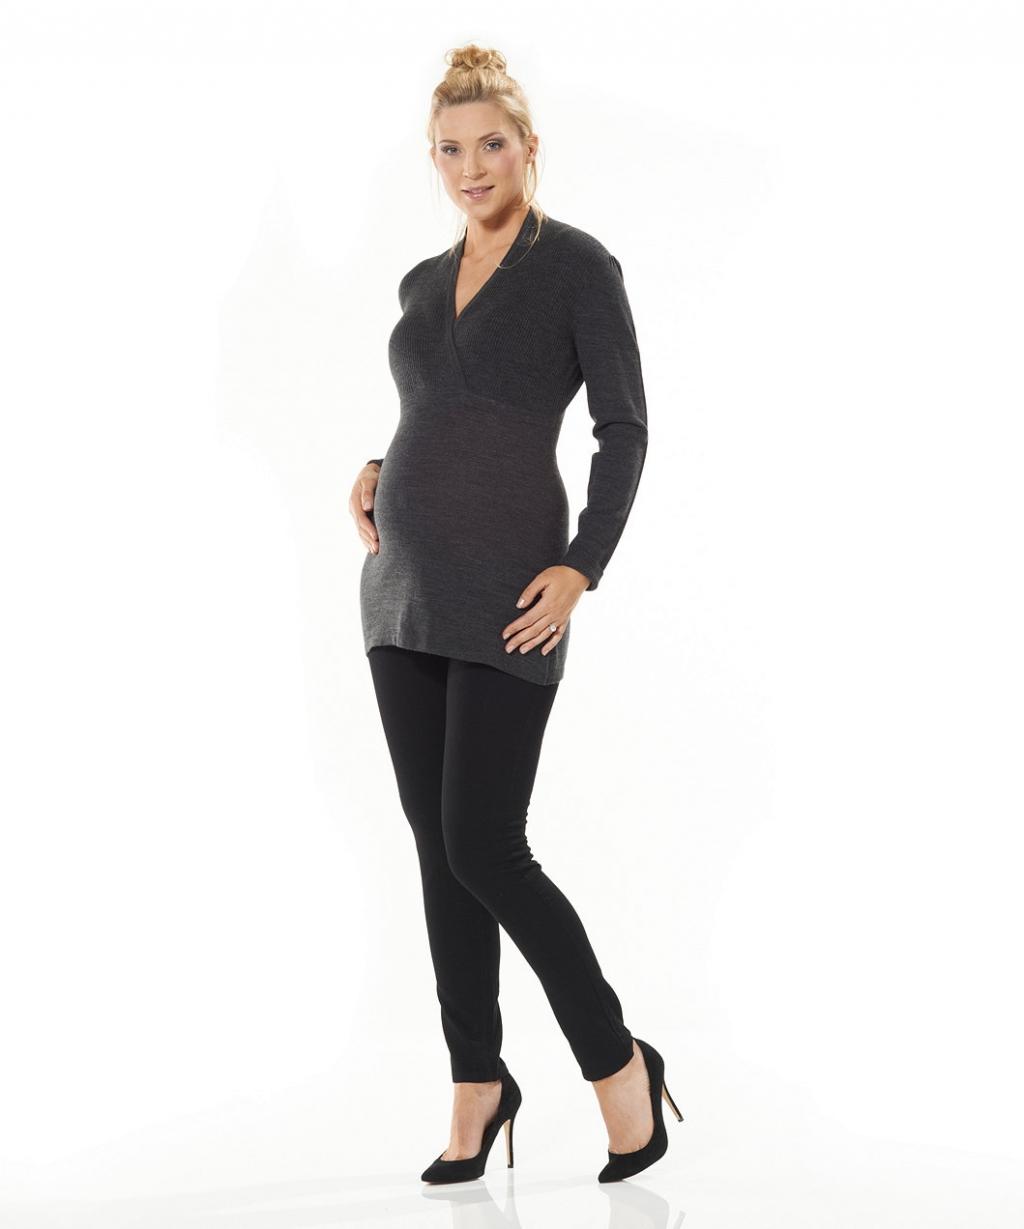 Джемпер для майбутніх мам, колір сірий (Mothercare)